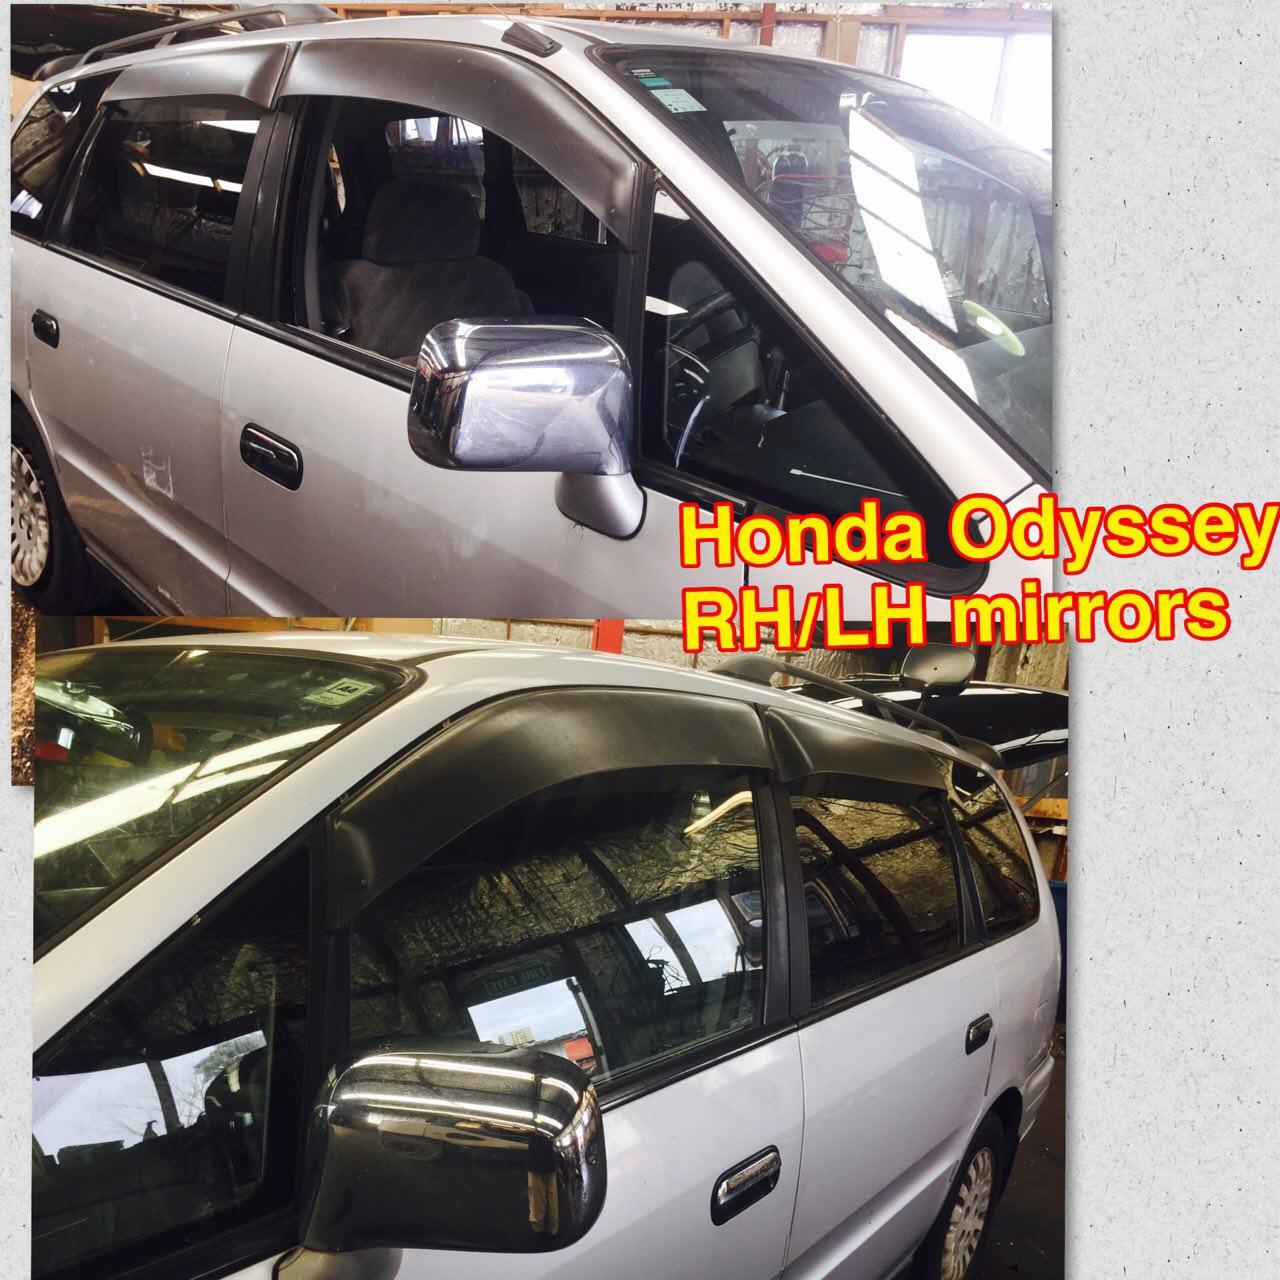 Honda Odyssey (RHLH Mirrors)